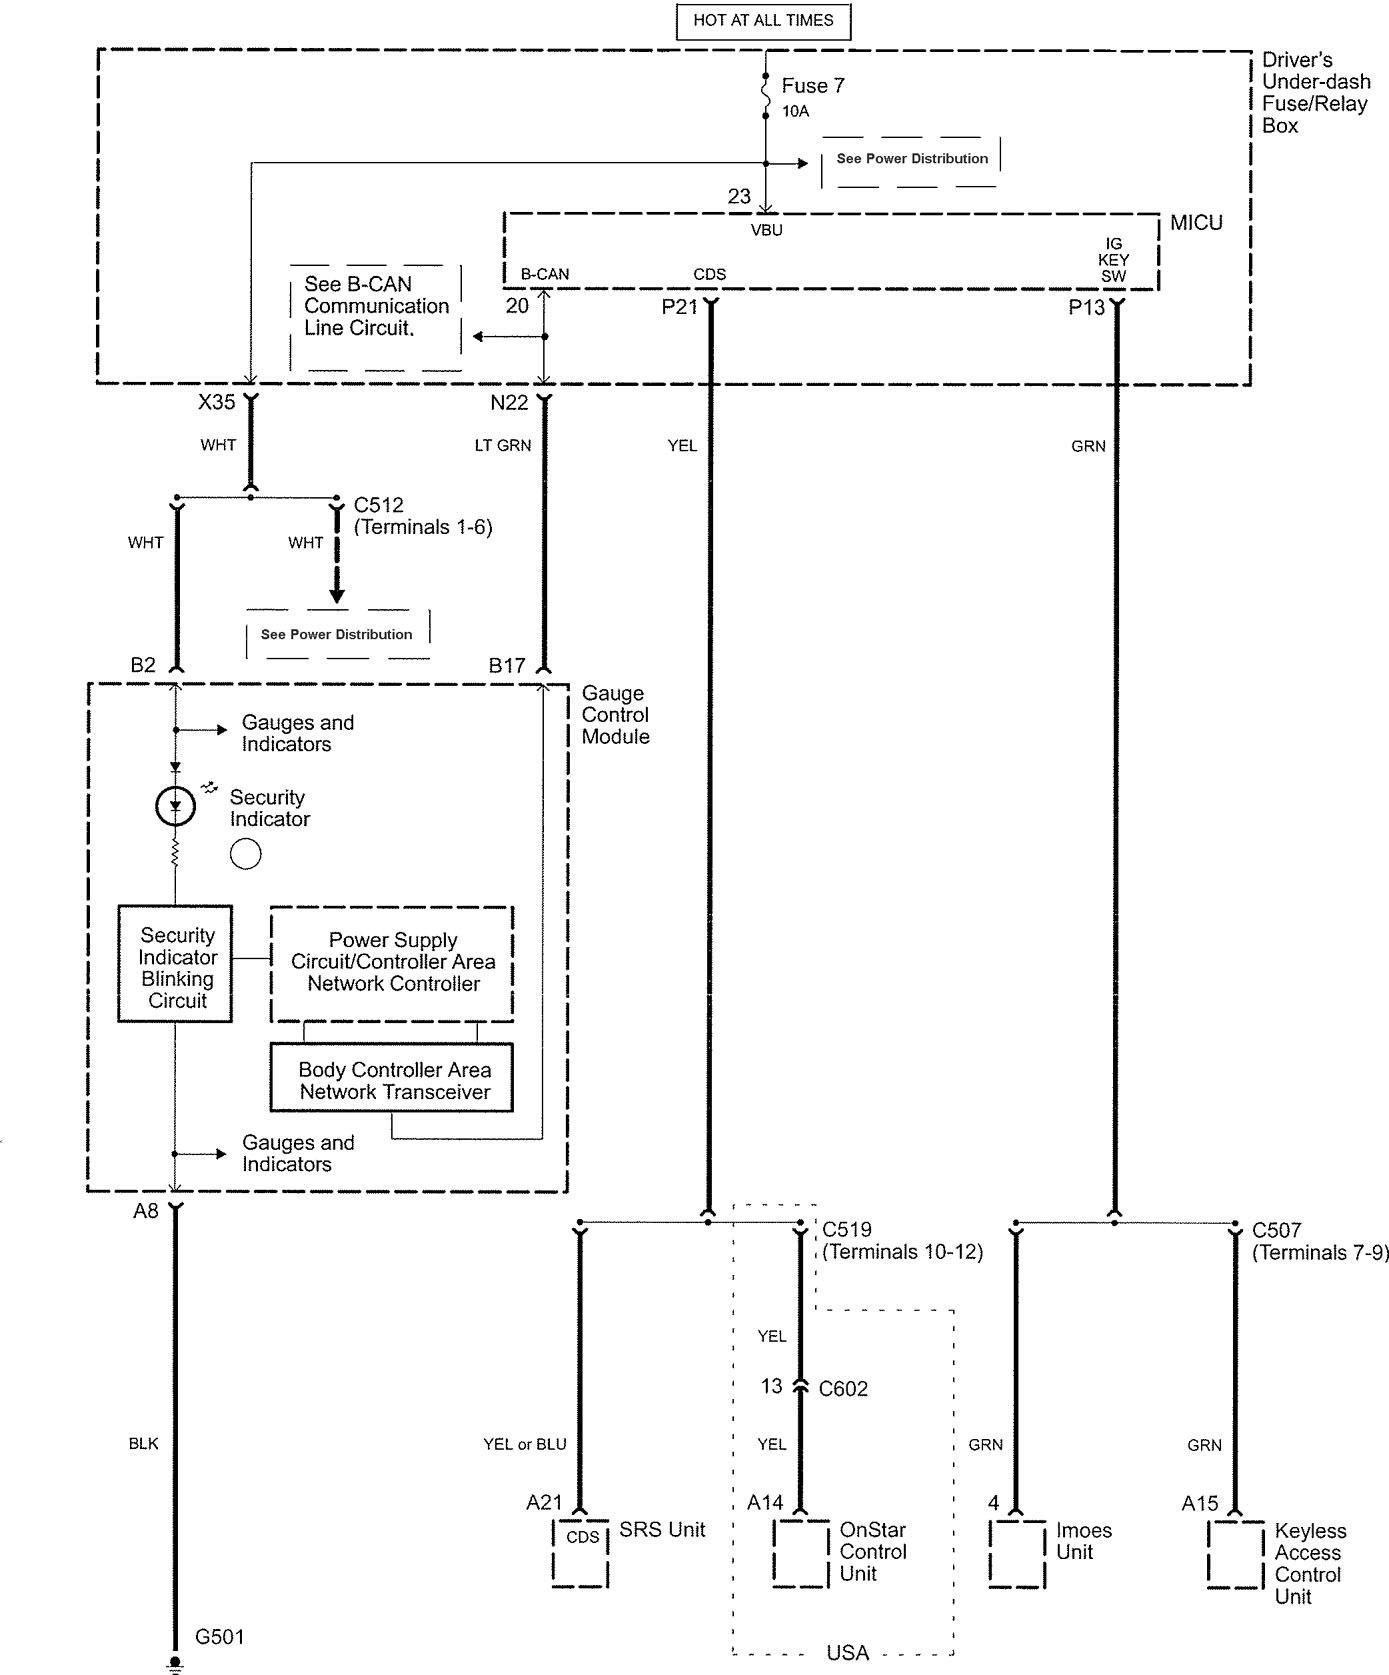 Acura RL (2005) - wiring diagrams - keyless entry - Carknowledge.info   Acura Rl Wiring Diagram      Carknowledge.info